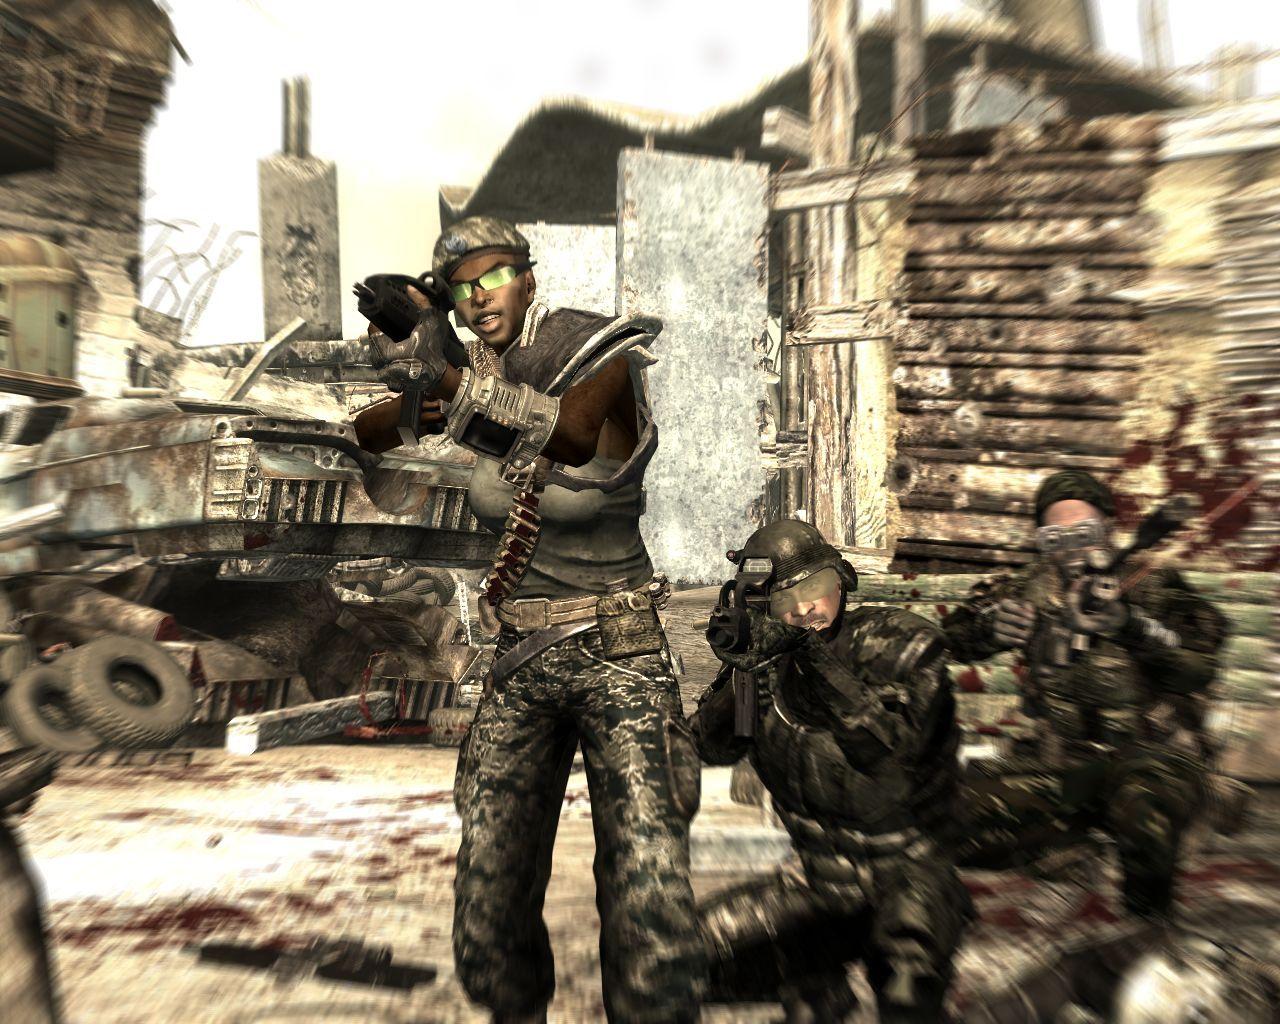 Fallout 3 Mothership Zeta Crew Проблемы С Текстурами